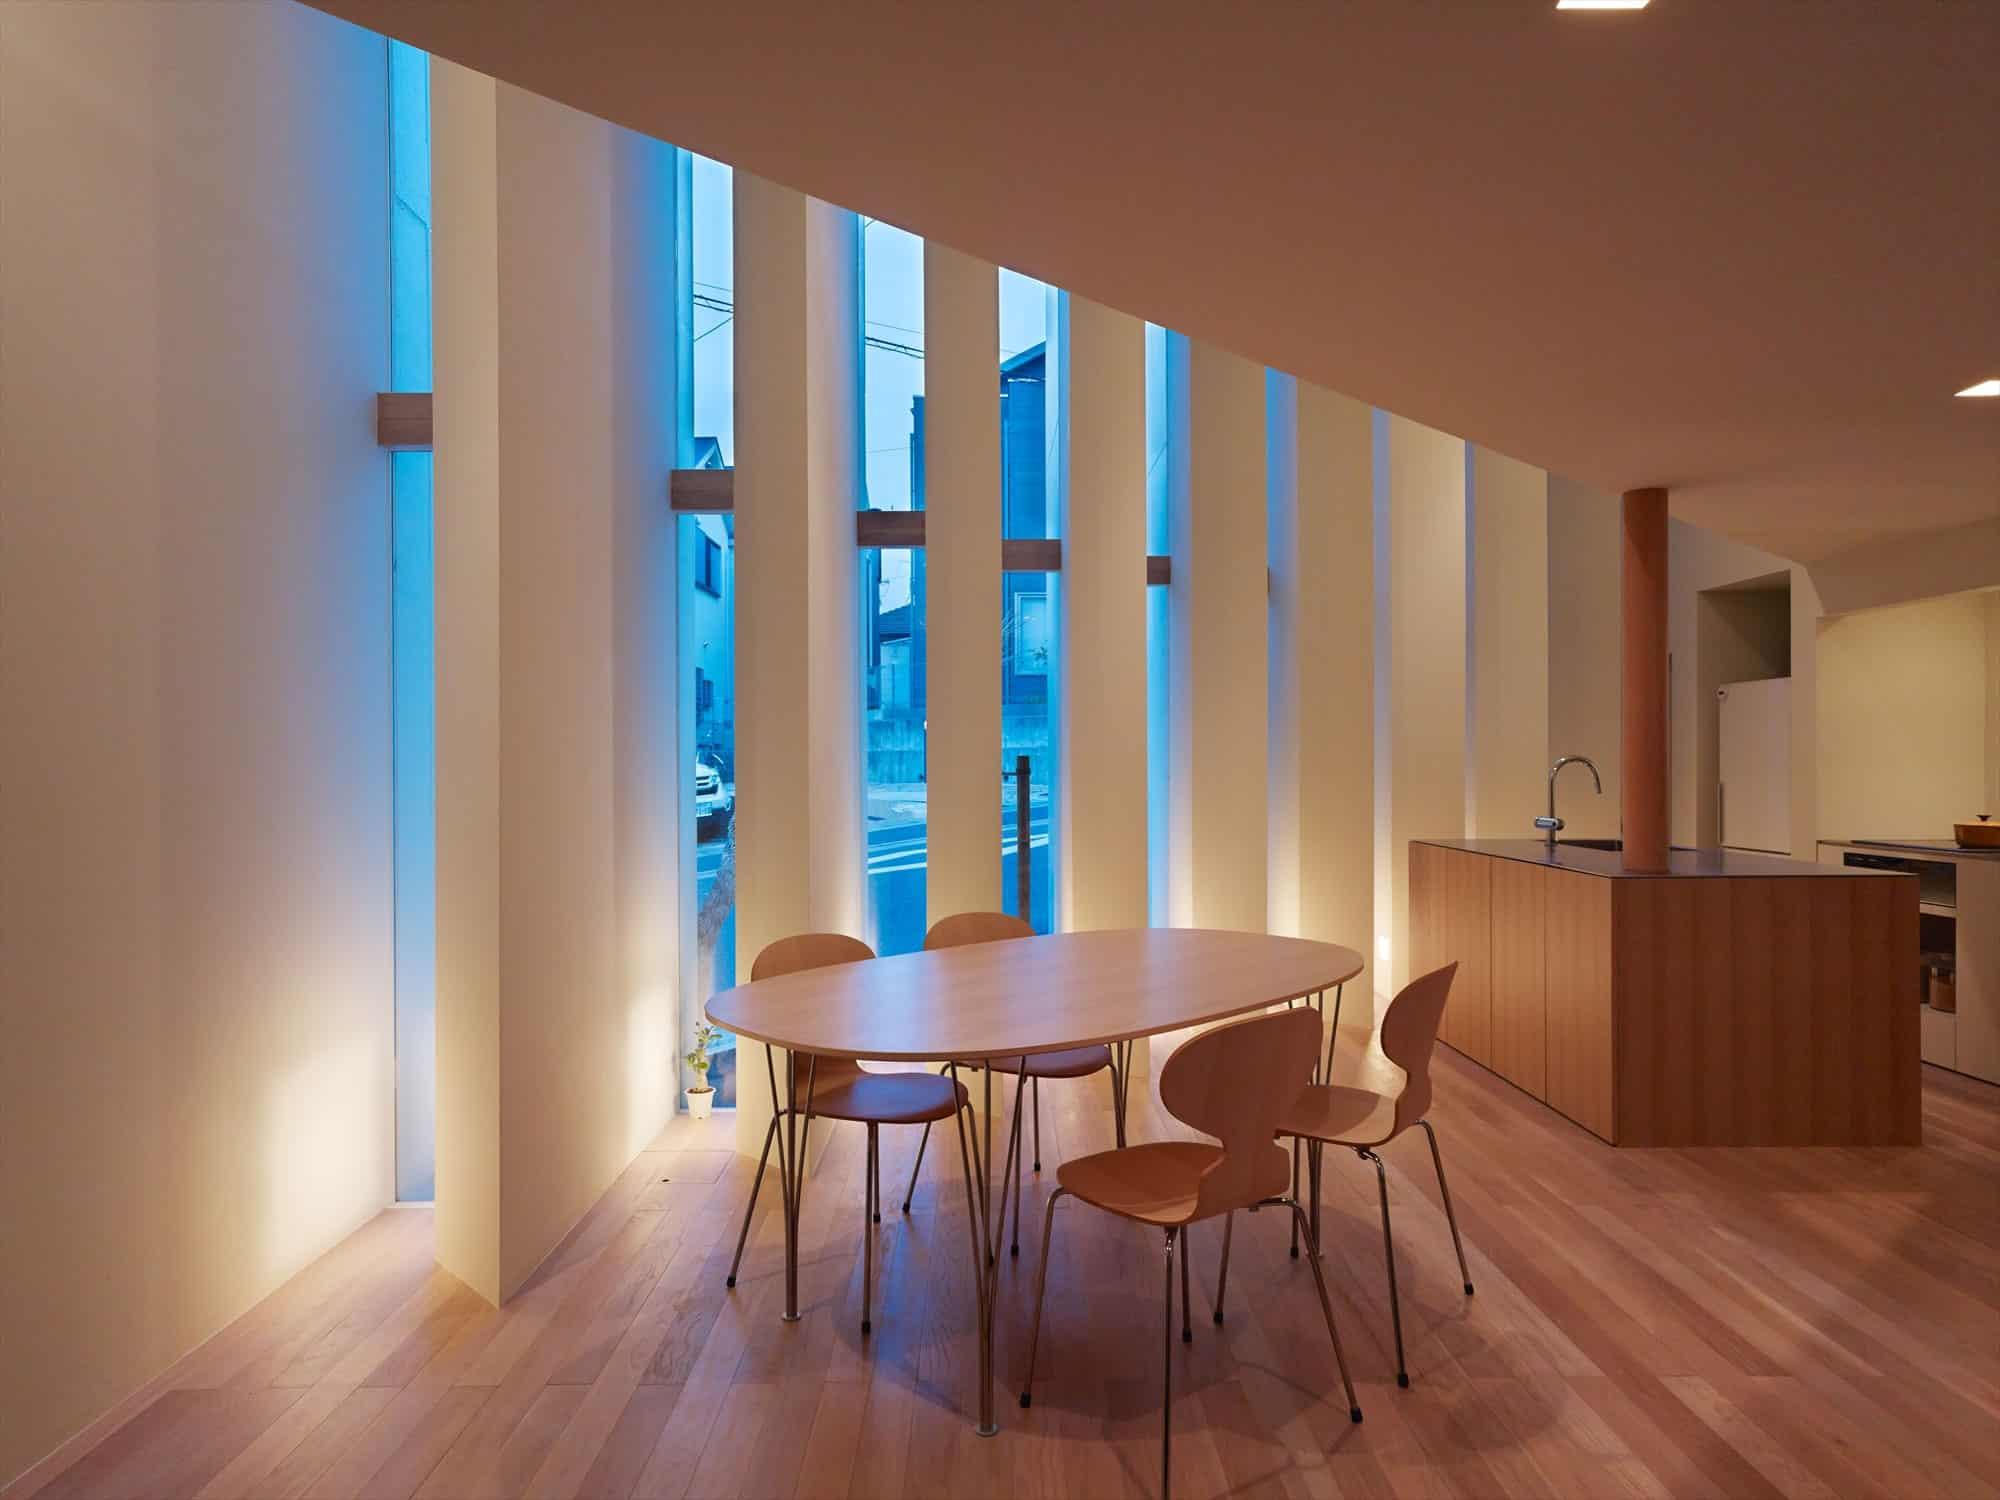 House in Muko by Fujiwarramuro Architects (5)